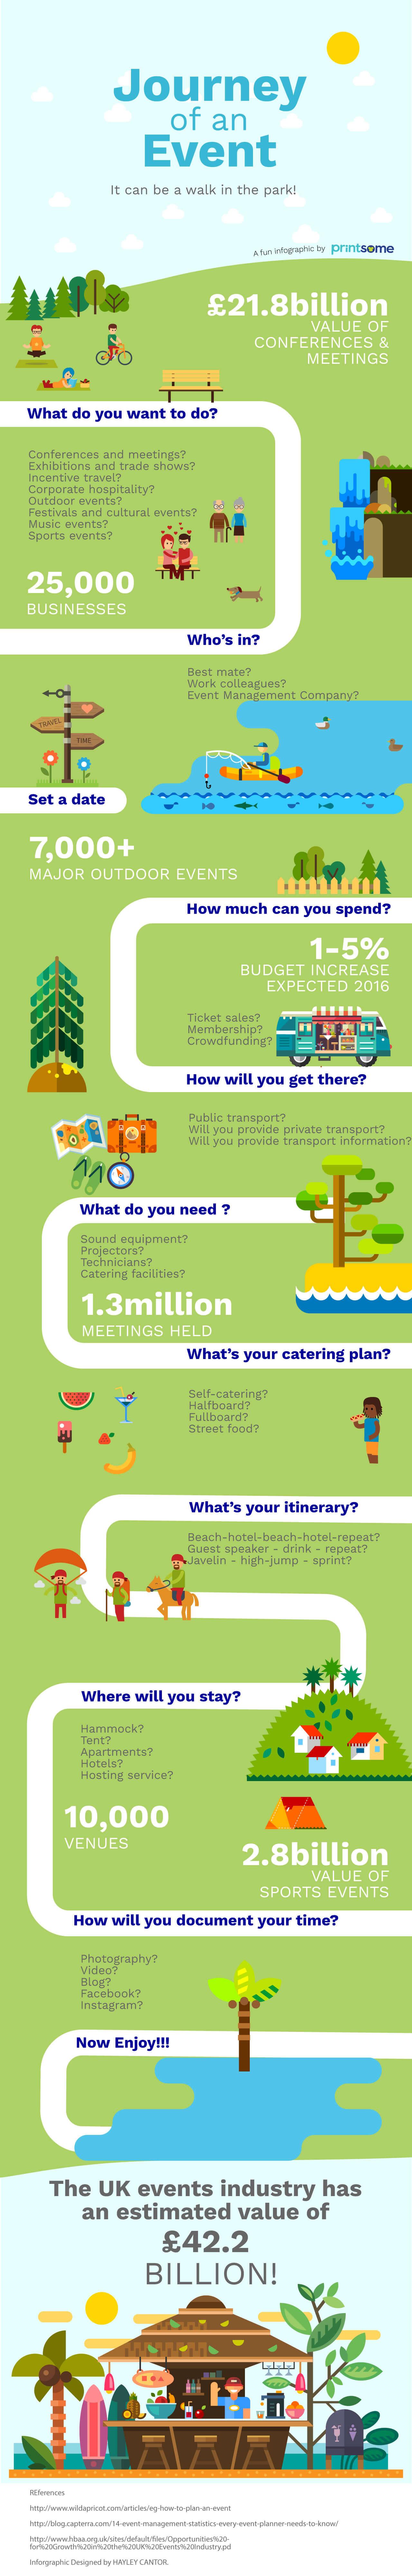 event-journey-infographic-plaza